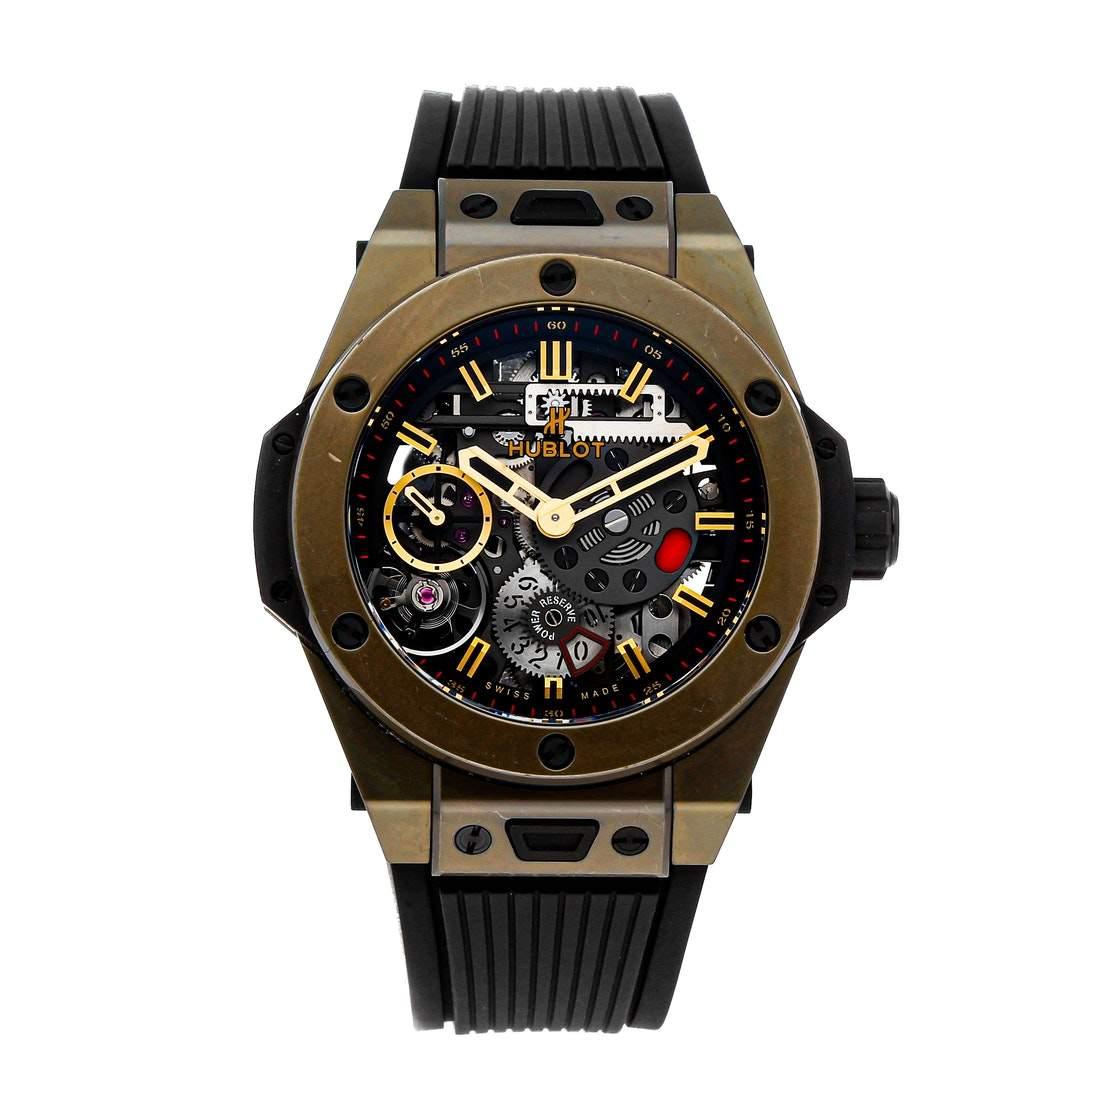 Hublot Black Magic Gold Big Bang Meca-10 Full Magic Gold Limited Edition 414.MX.1138.RX Men's Wristwatch 45 MM